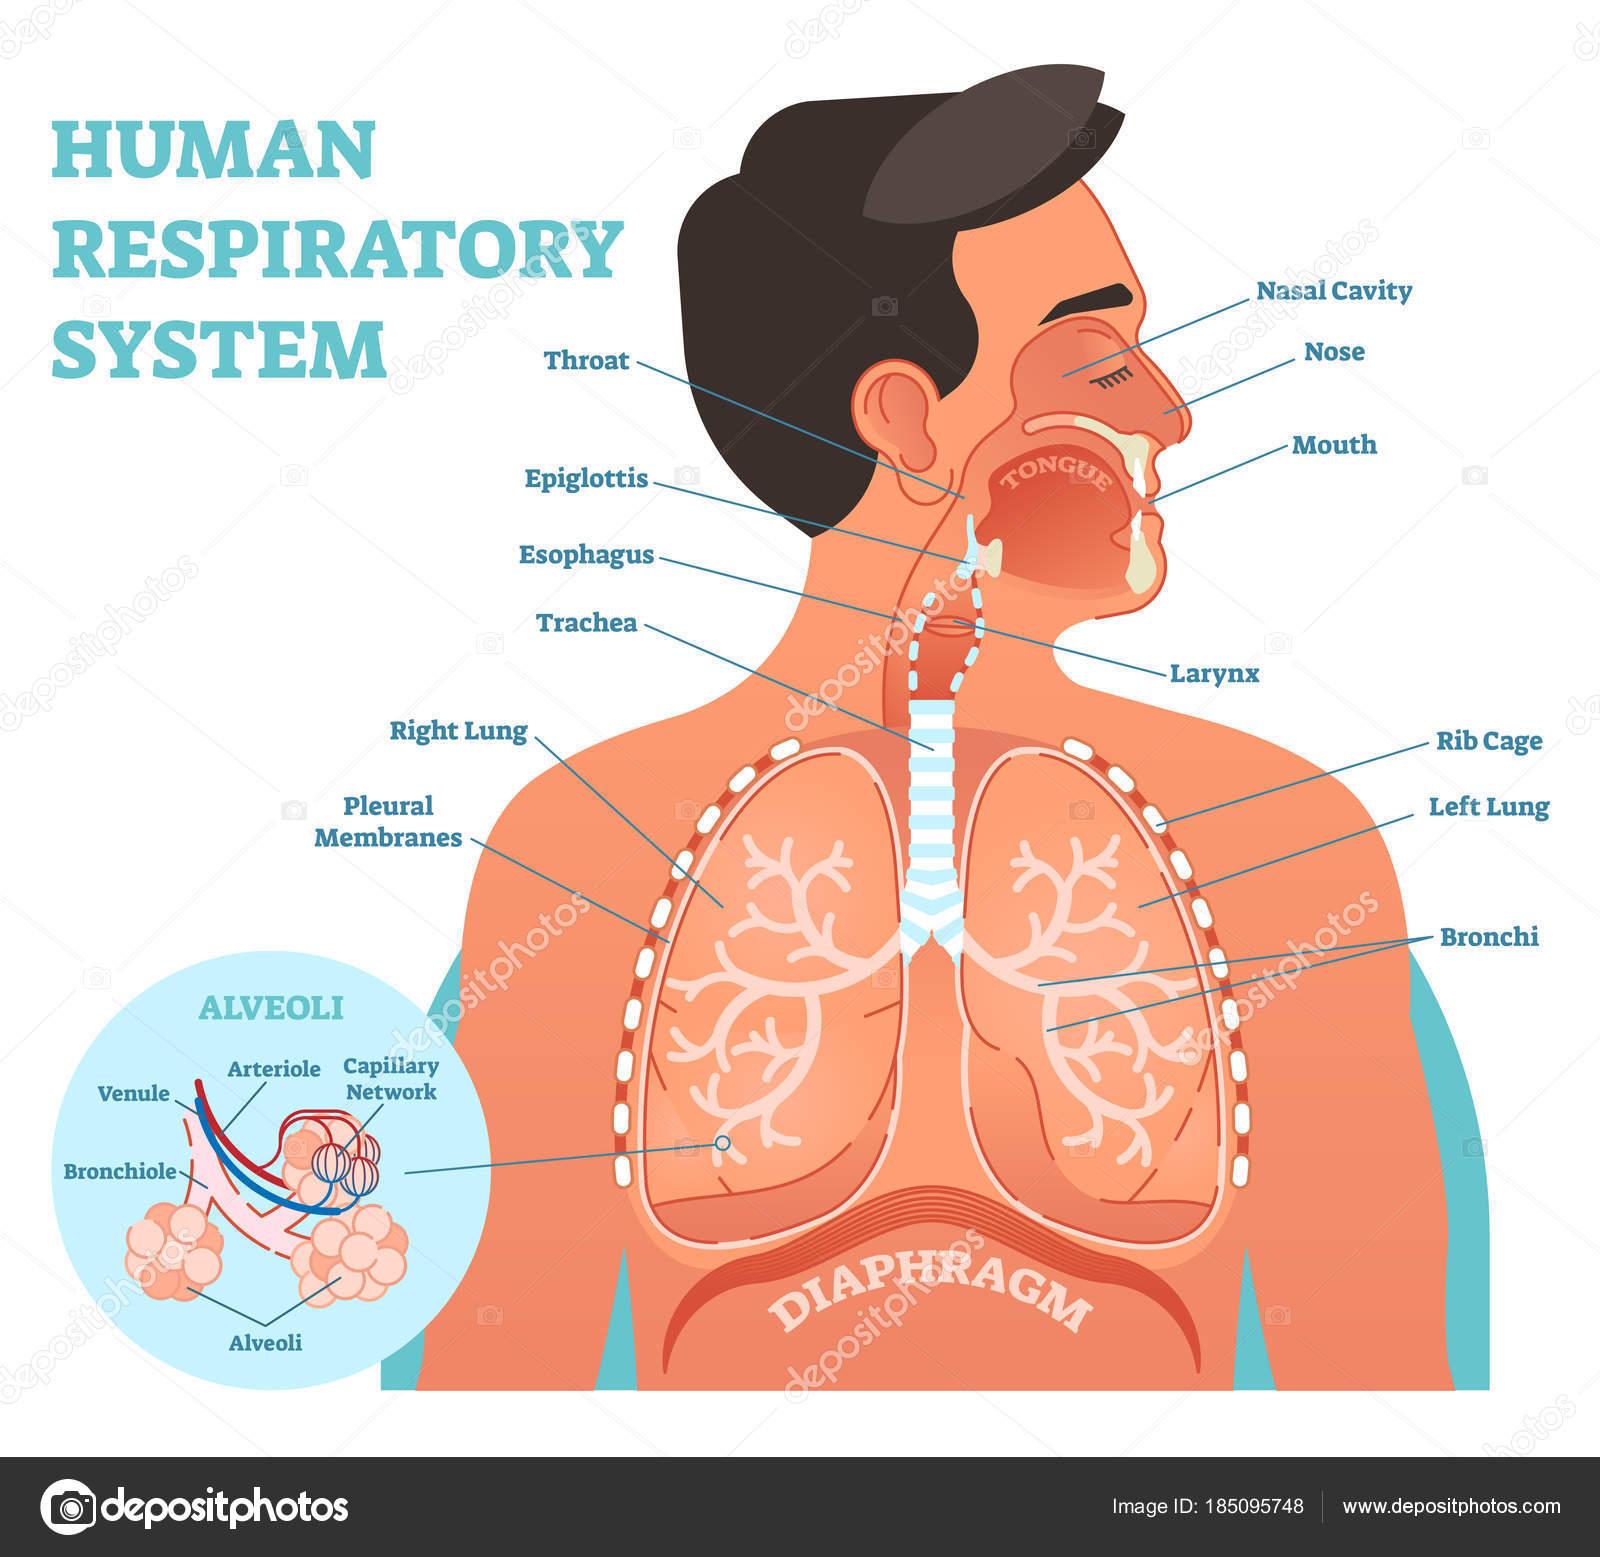 Respiratory System Diagram Human Respiratory System Anatomical Vector Illustration Medical